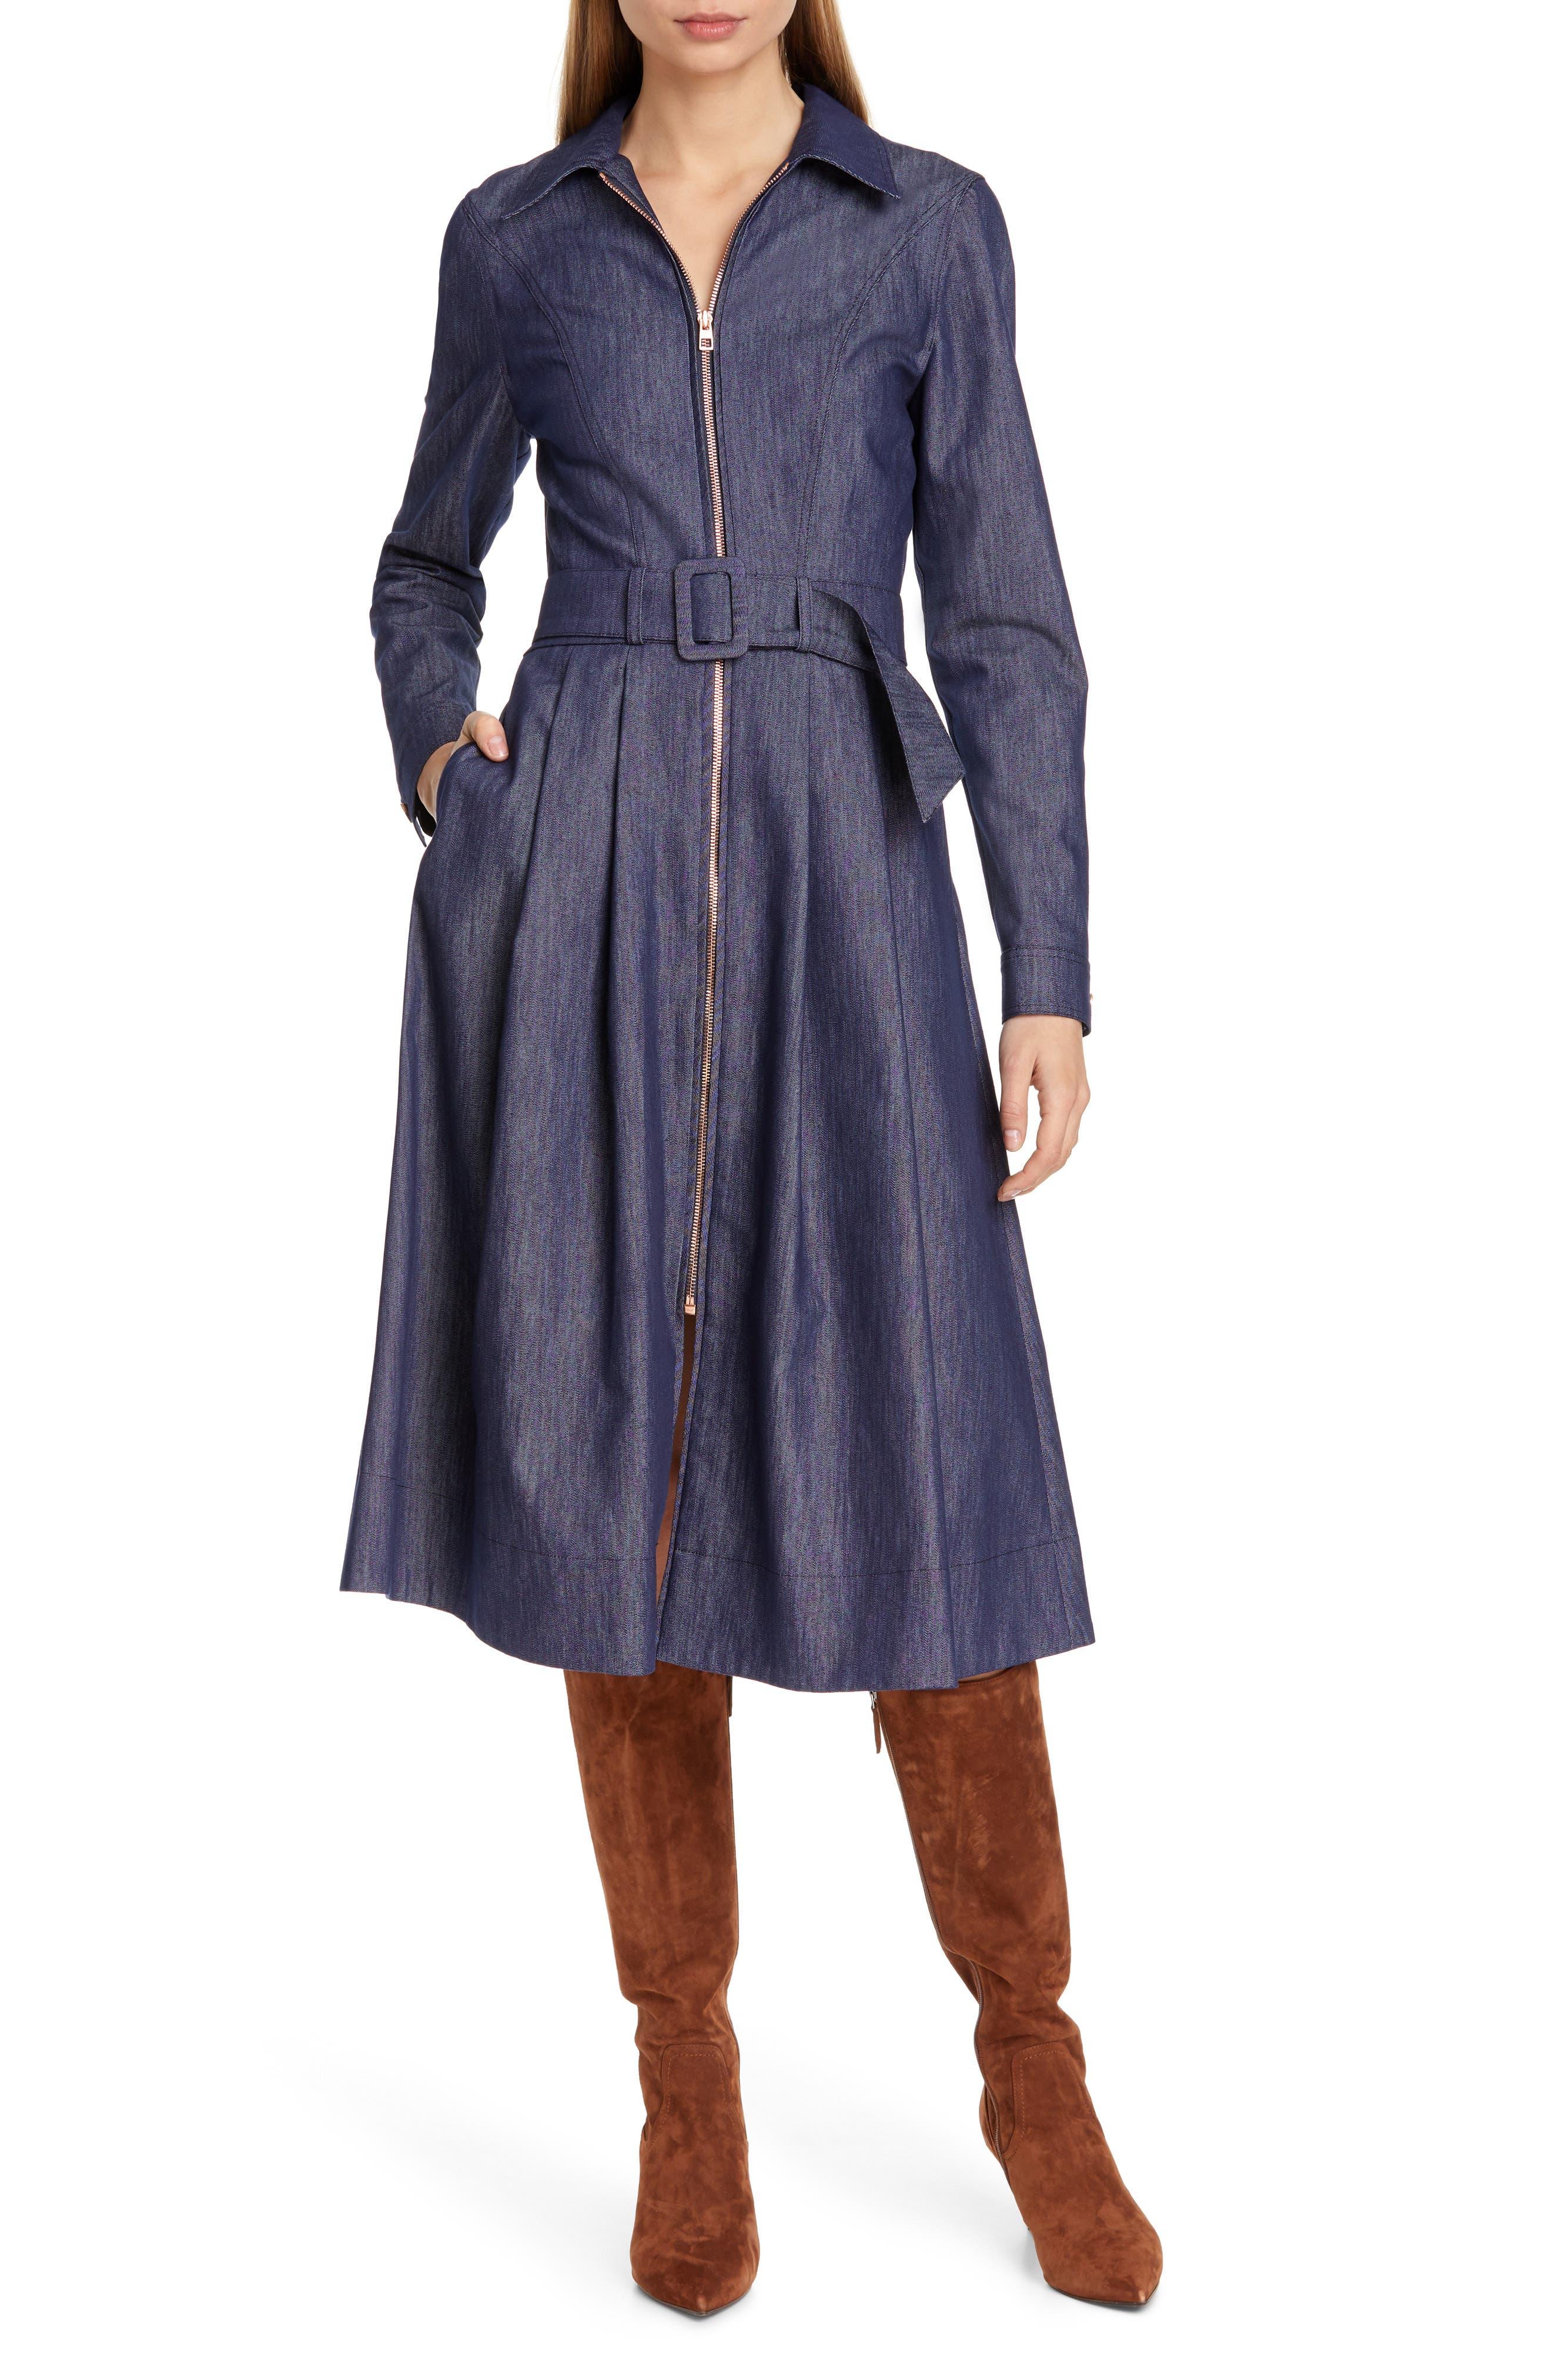 TOMMY X ZENDAYA, Belted Denim Dress, Main thumbnail 1, color, DENIM BLUE